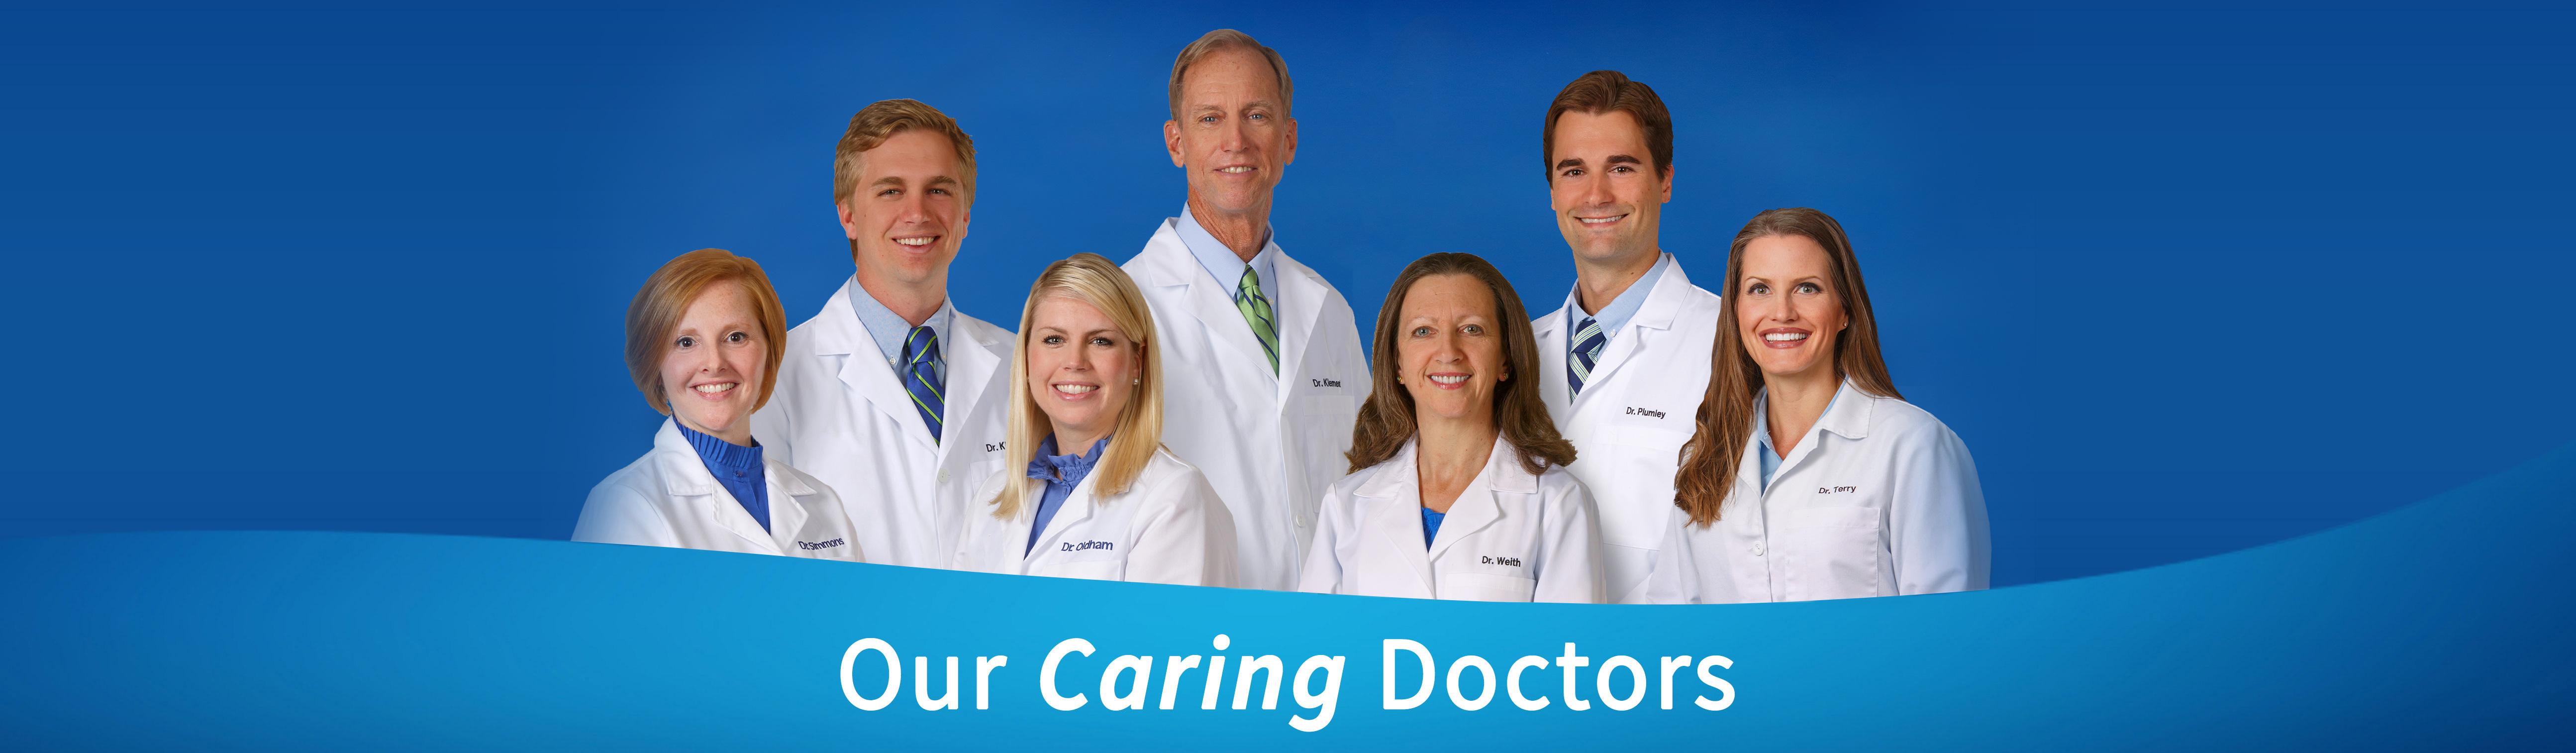 Klement Family Dental Reviews, Ratings | Dental Hygienists near 425 22nd Ave N , St. Petersburg FL